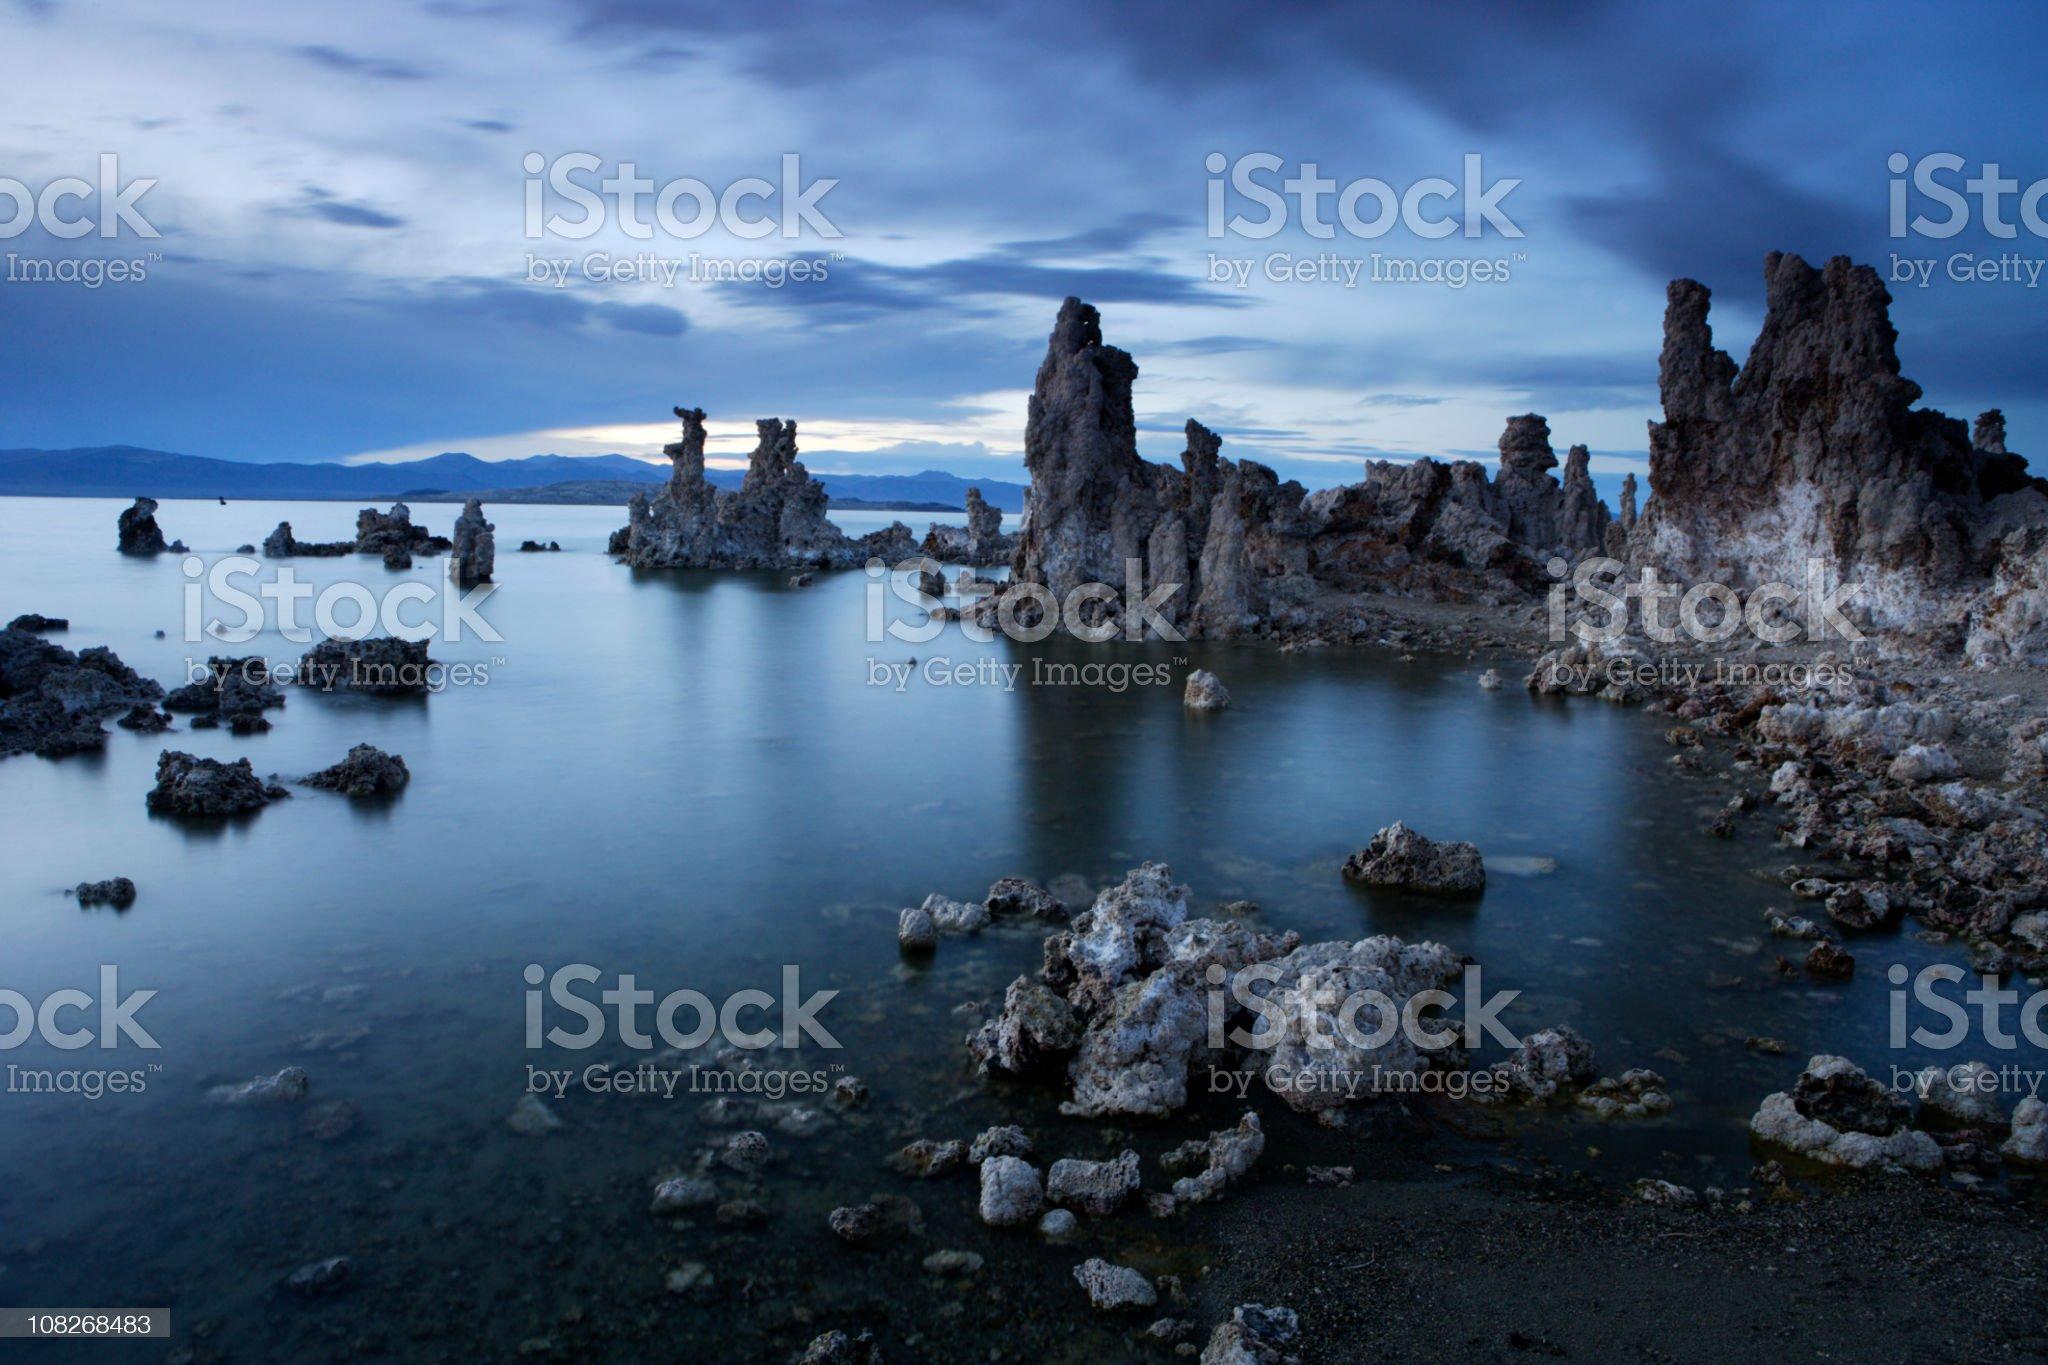 Mono Lake Rock Formations at Twilight royalty-free stock photo